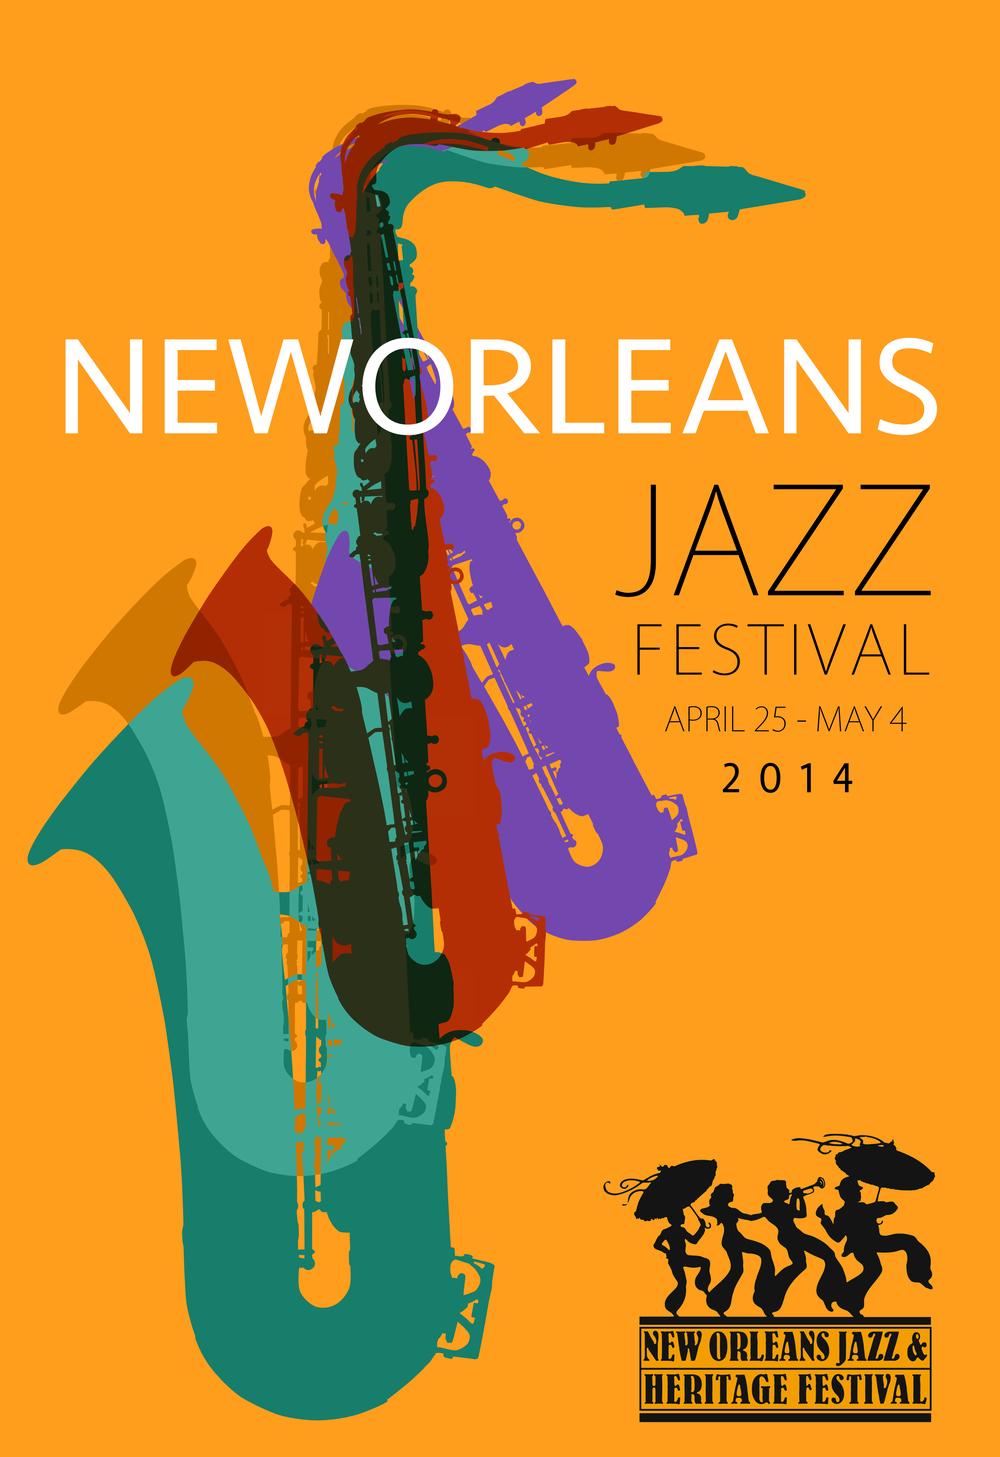 Jazz Festival New Orleans poster